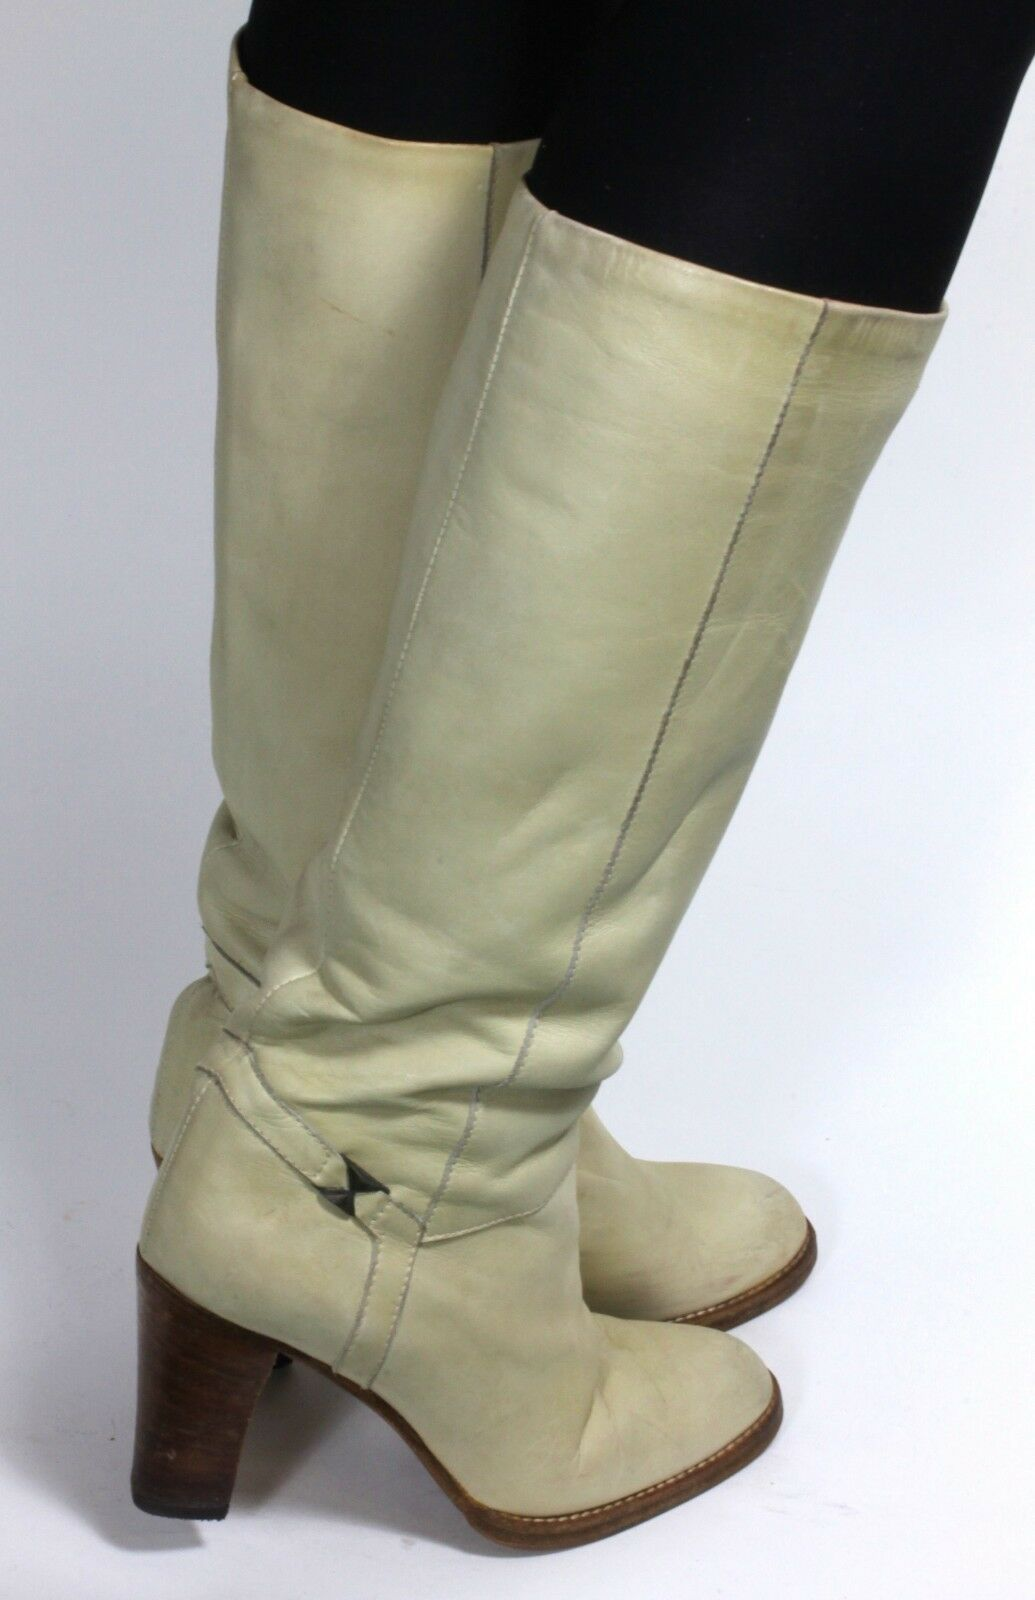 Damenstiefel Vintage Stiefel True Vintage Boots Beige Creme Zierriemen 70s 38